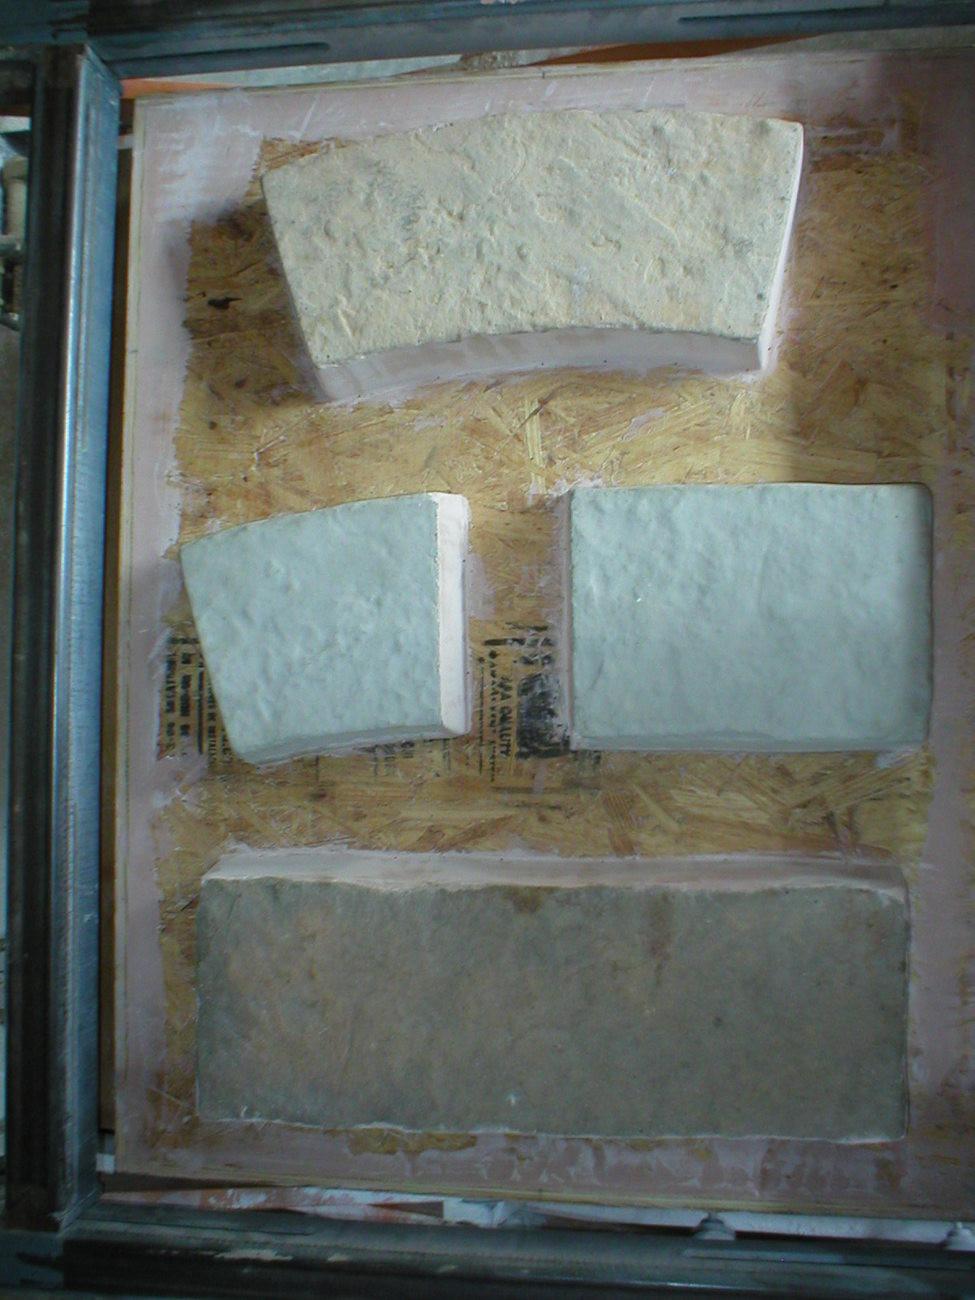 Concrete Landscape Edging Molds  Inspiring Concrete Landscape Edging Molds 7 Concrete Lawn